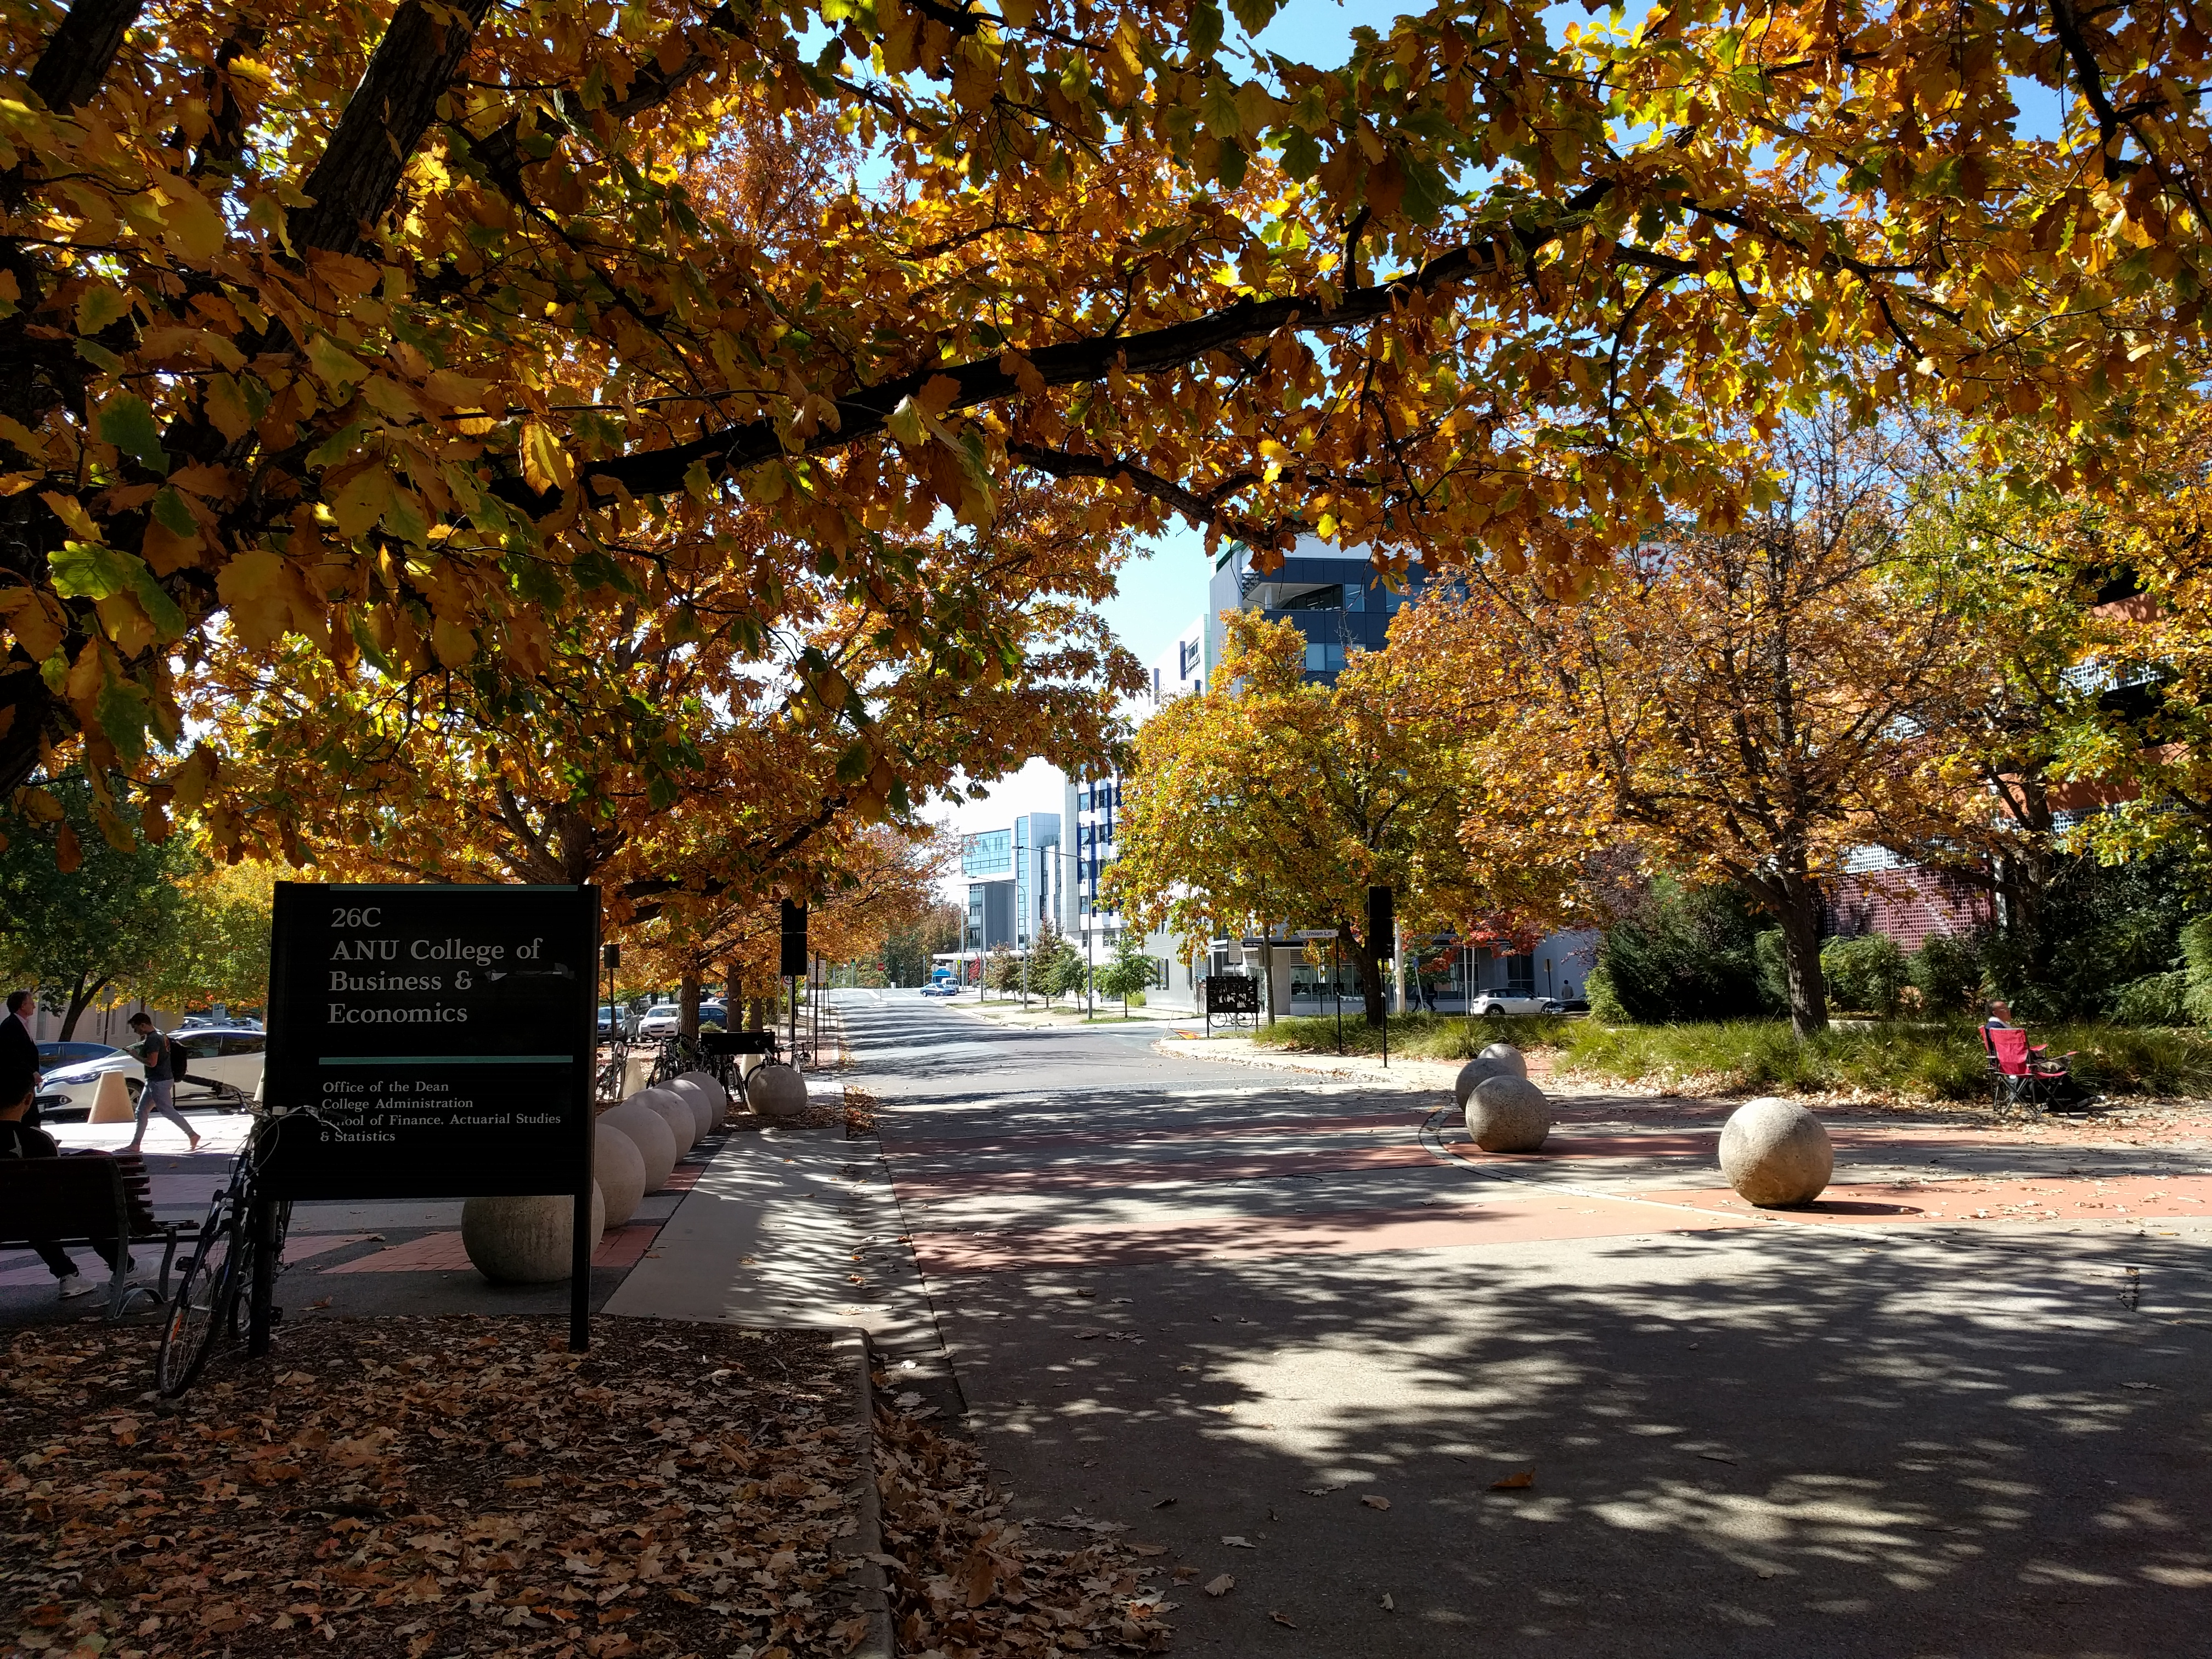 Universitas terbaik Australia jurusan bisnis - Australian National University